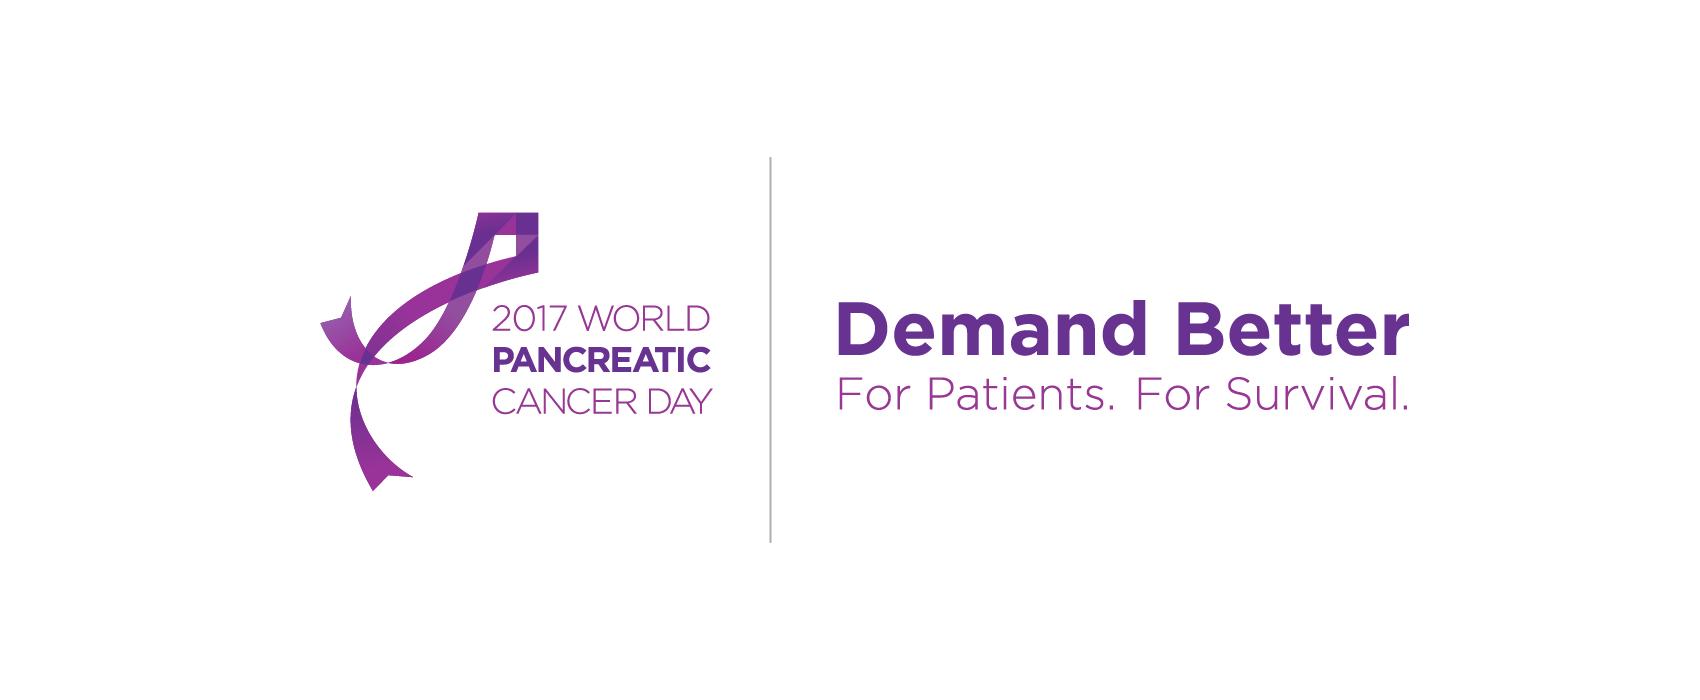 Demand Better. For Patients. For Survival.